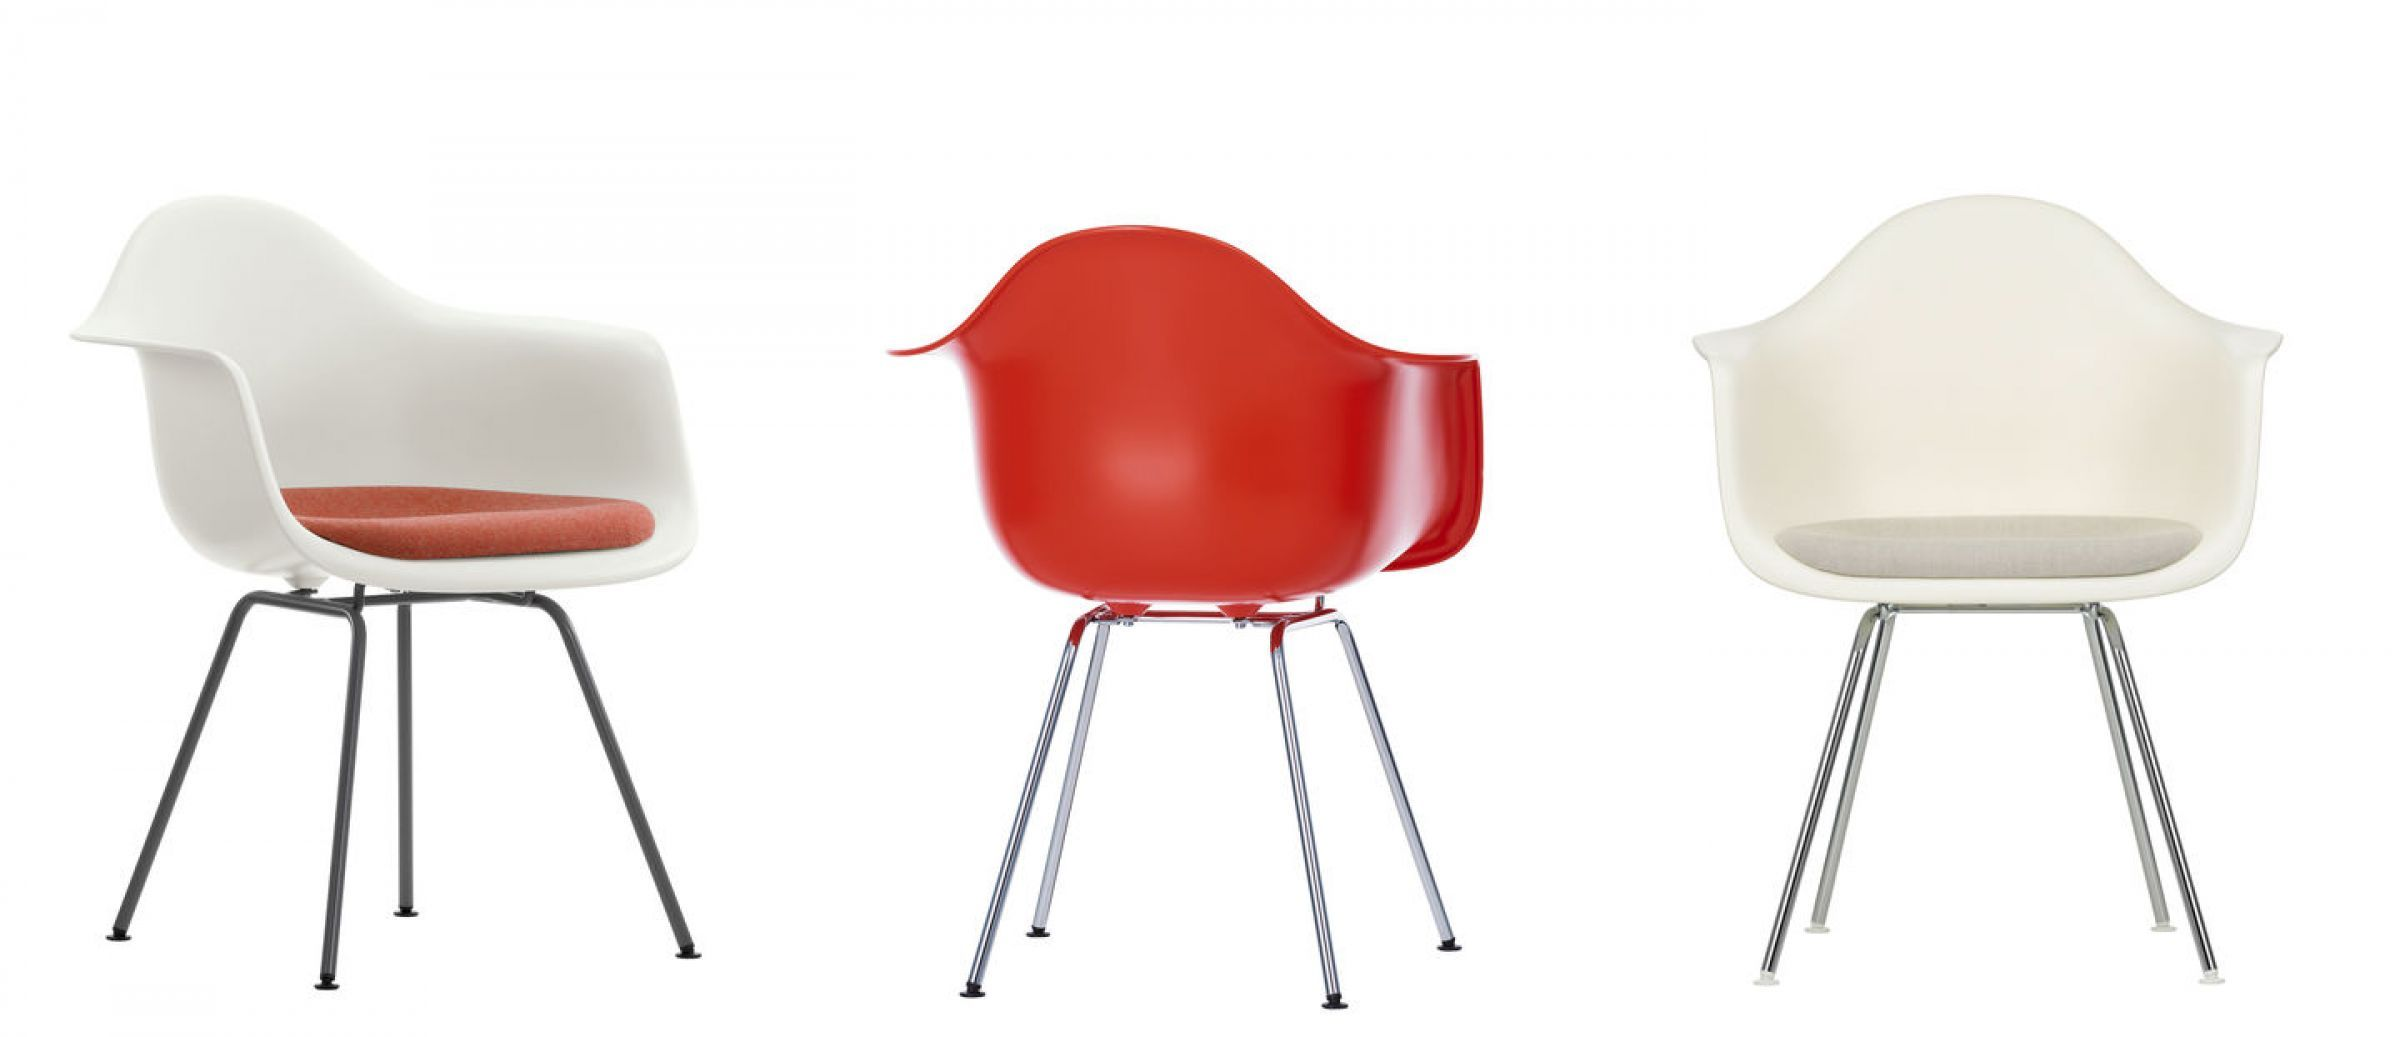 Vitra Eames Plastic Armchair DAX Eames stuhl